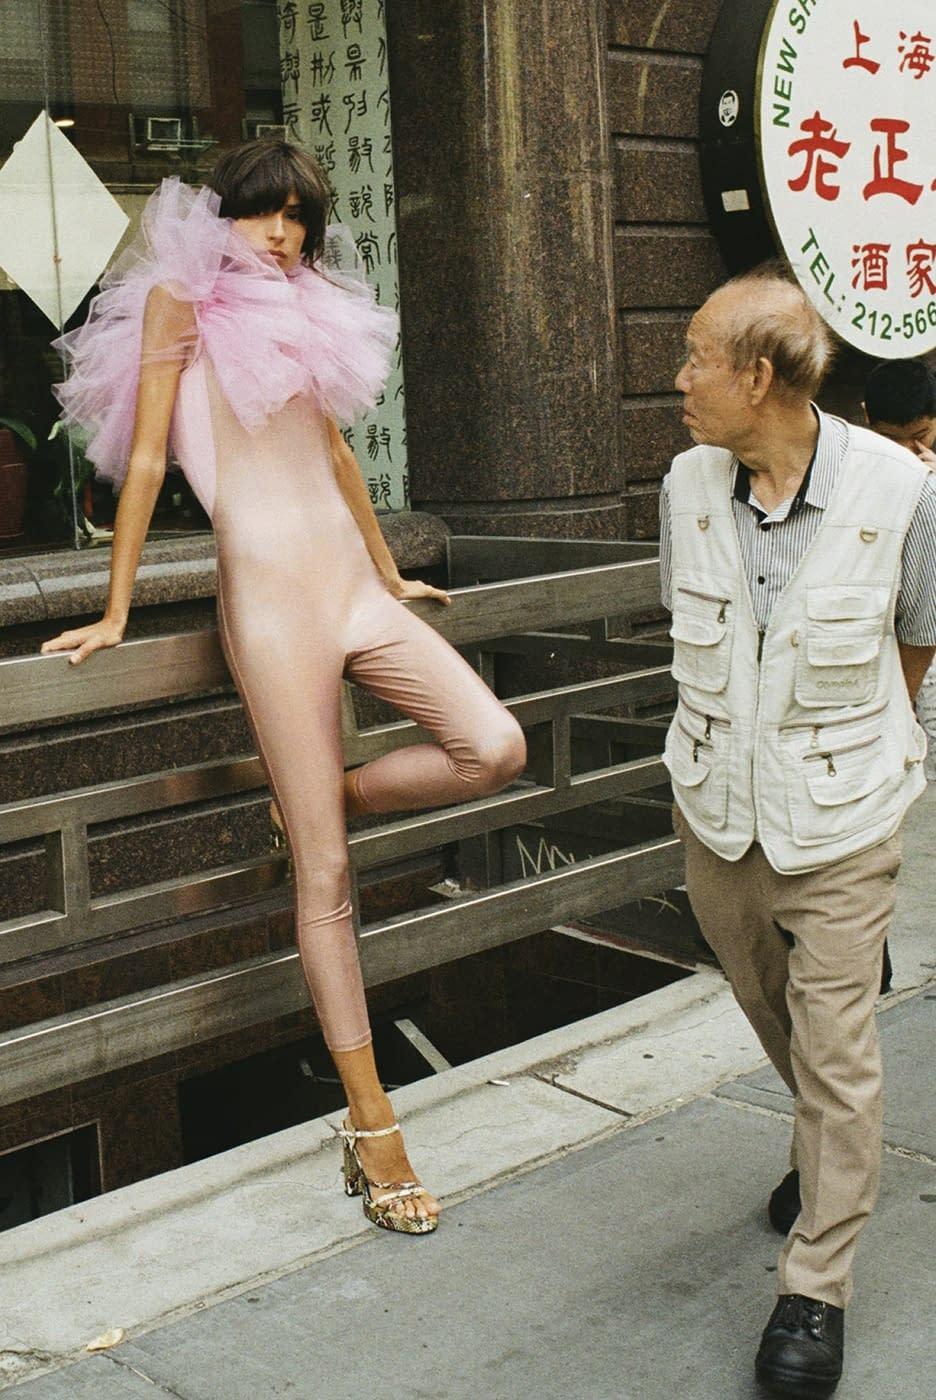 New York Stories 1 photo Enric Galceran - 13